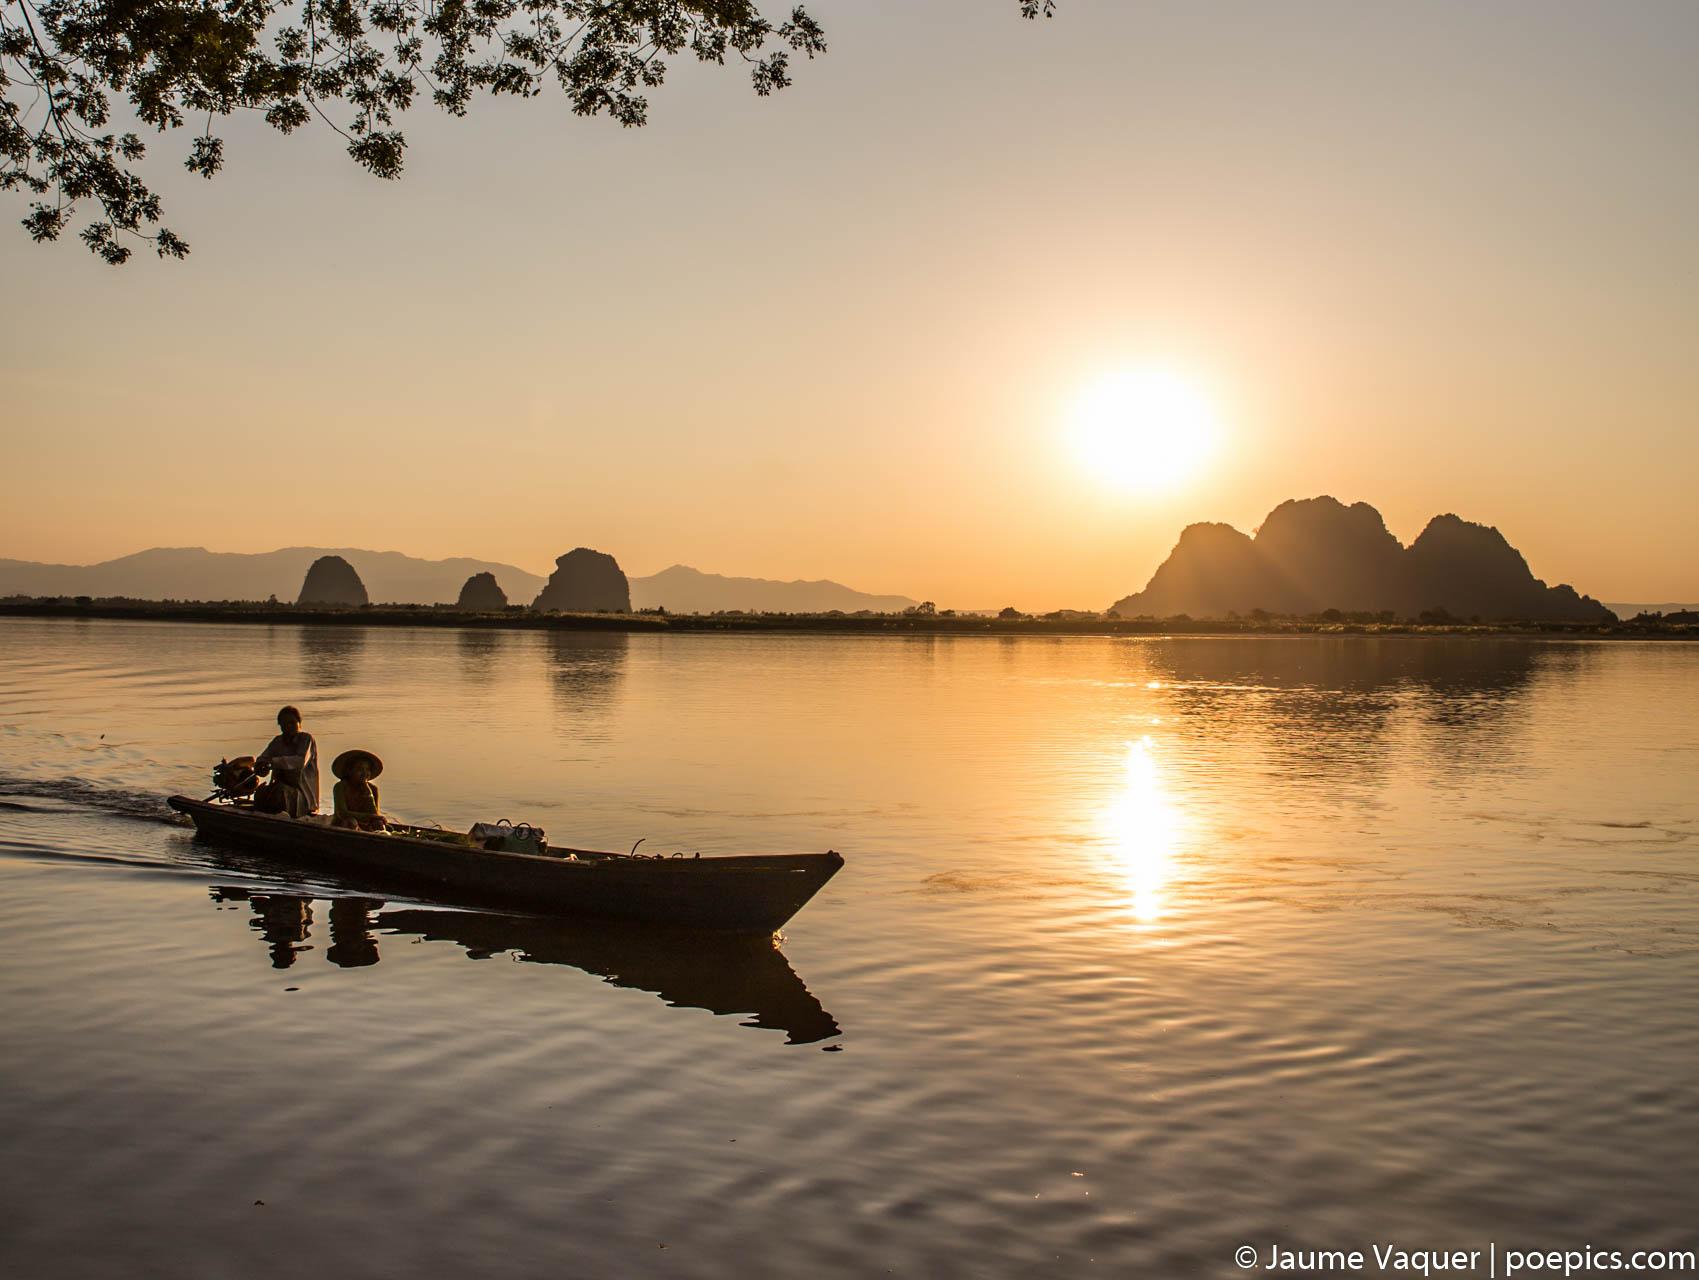 Sunset in Hpa-An, Myanmar (Burma)